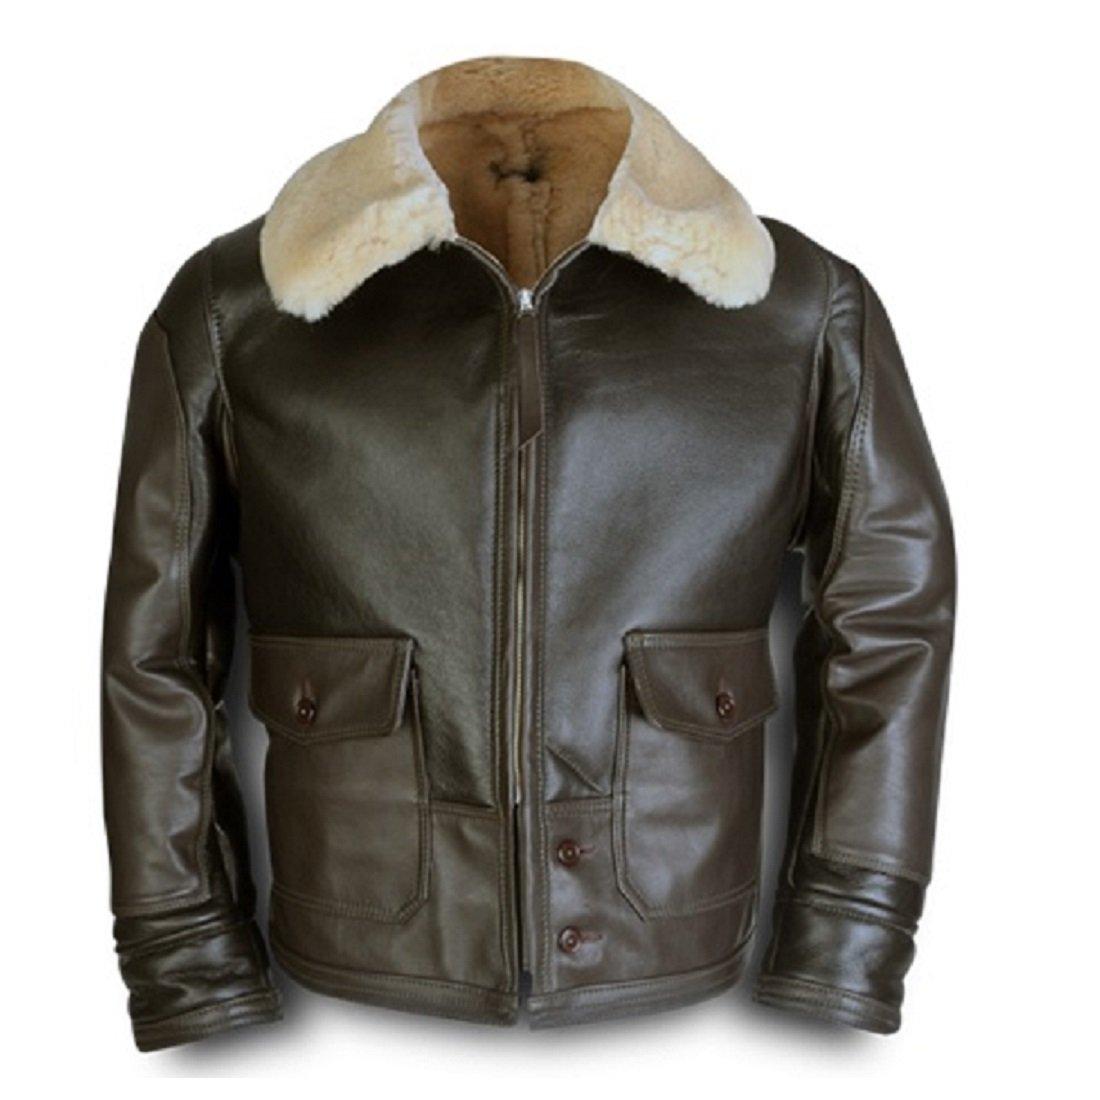 ANJ 4 Bomber Aviator A2 Pilot Police Sheepskin Fur Collar Aviation Fighter RAF B3 Leather Jacket